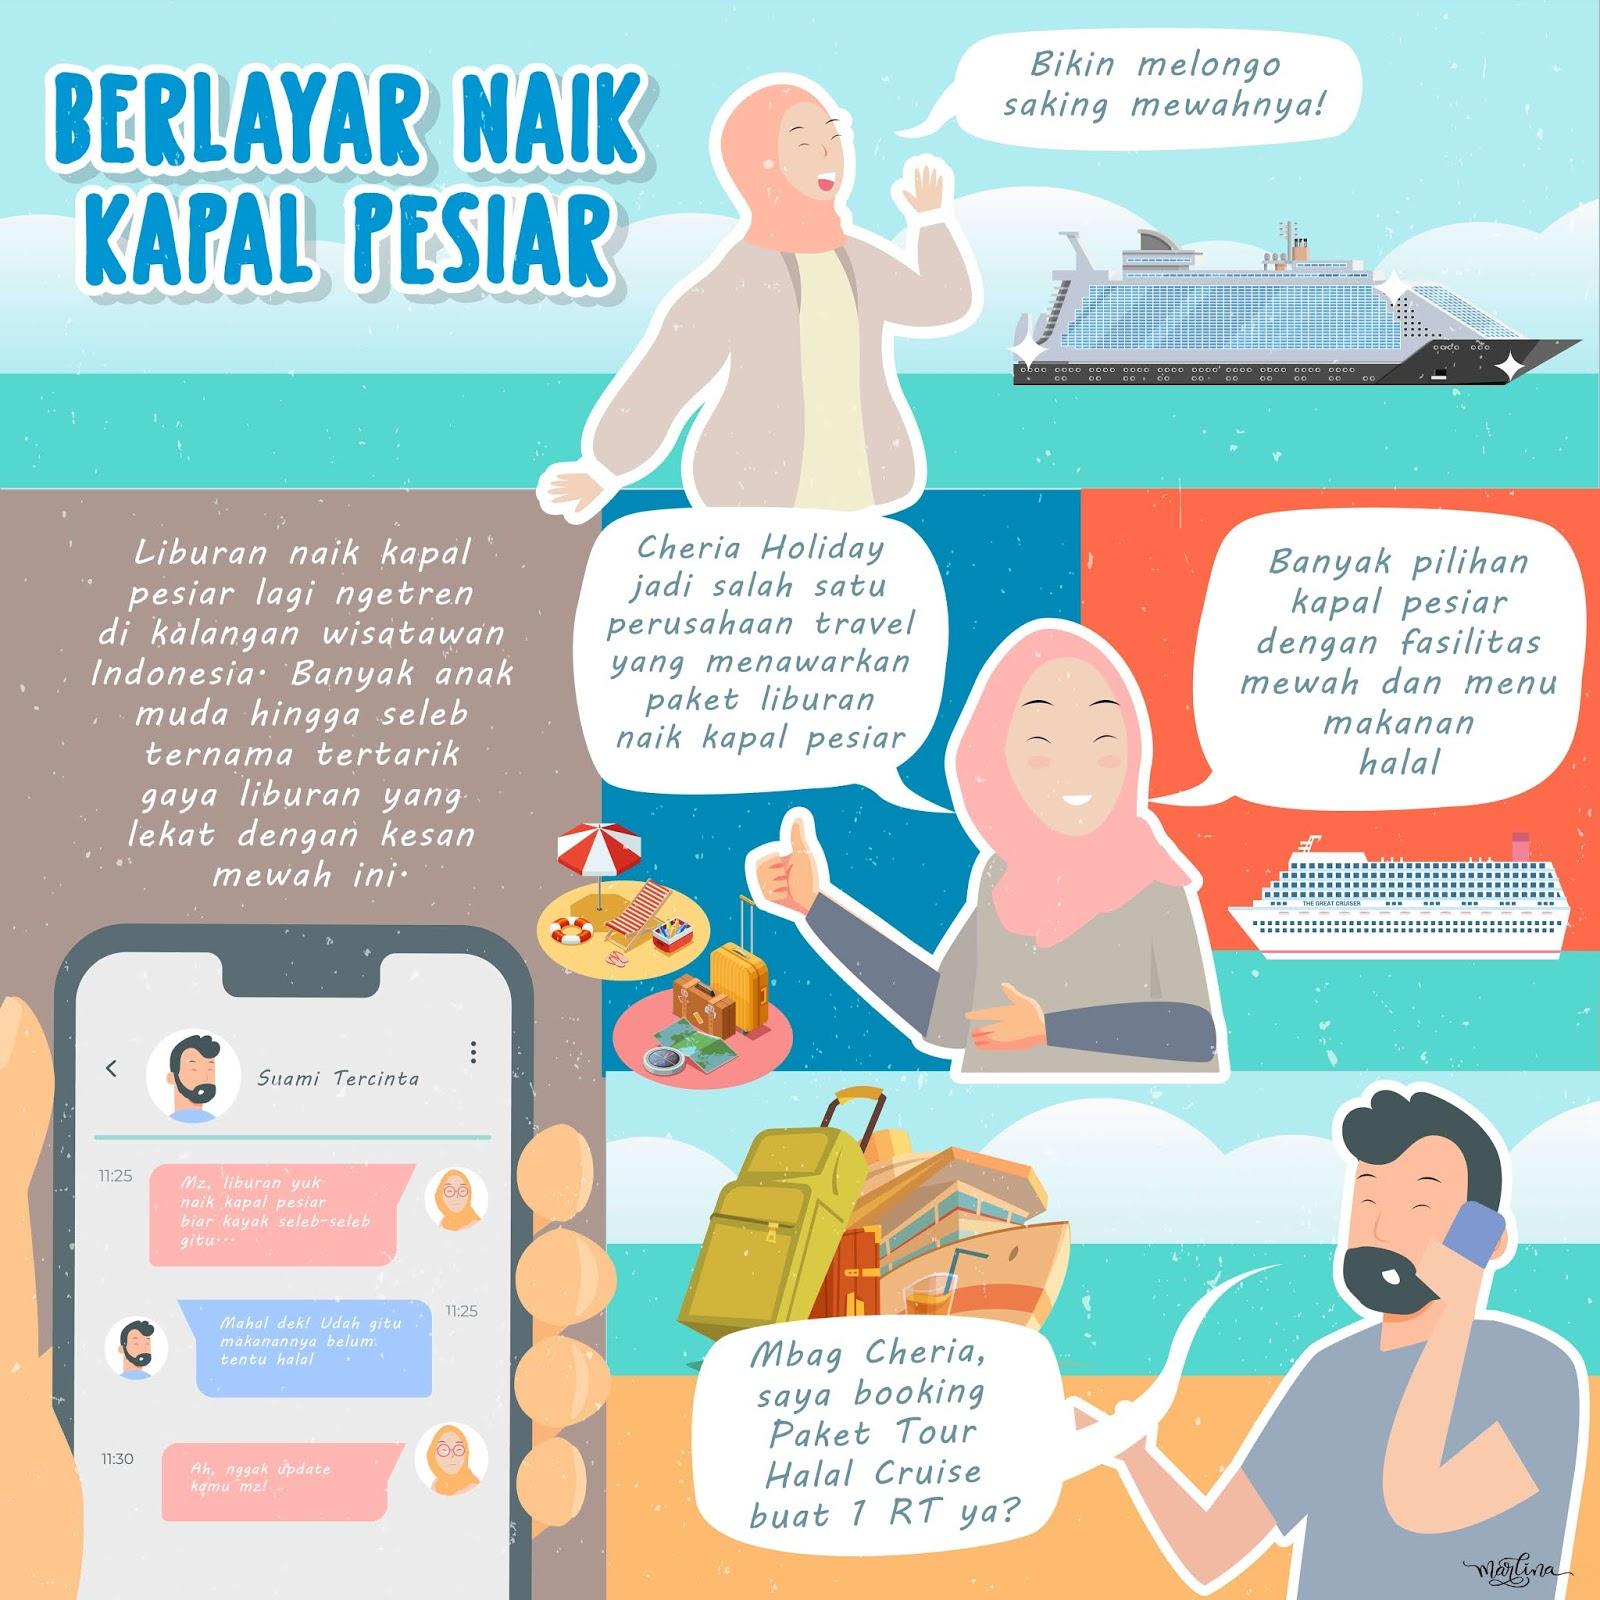 Infografis Paket Tour Halal Cruise Cheria Holiday